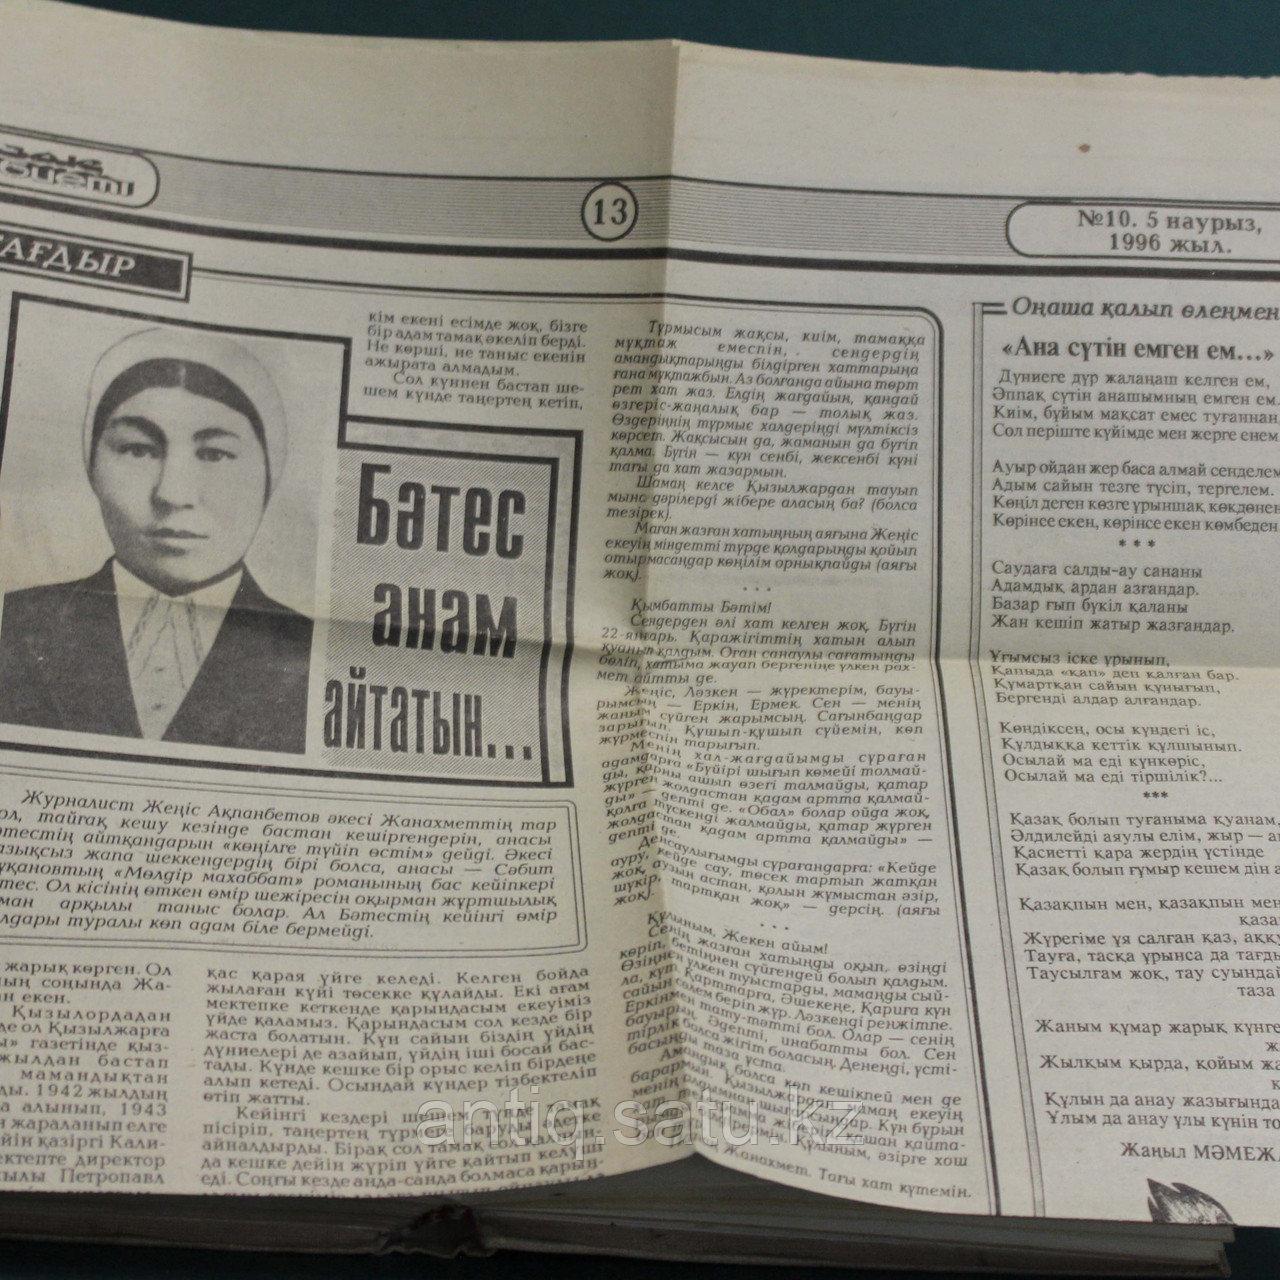 РОМАН «АДАСКАНДАР» Автор - Сабит Муканов (1900-1973). - фото 6